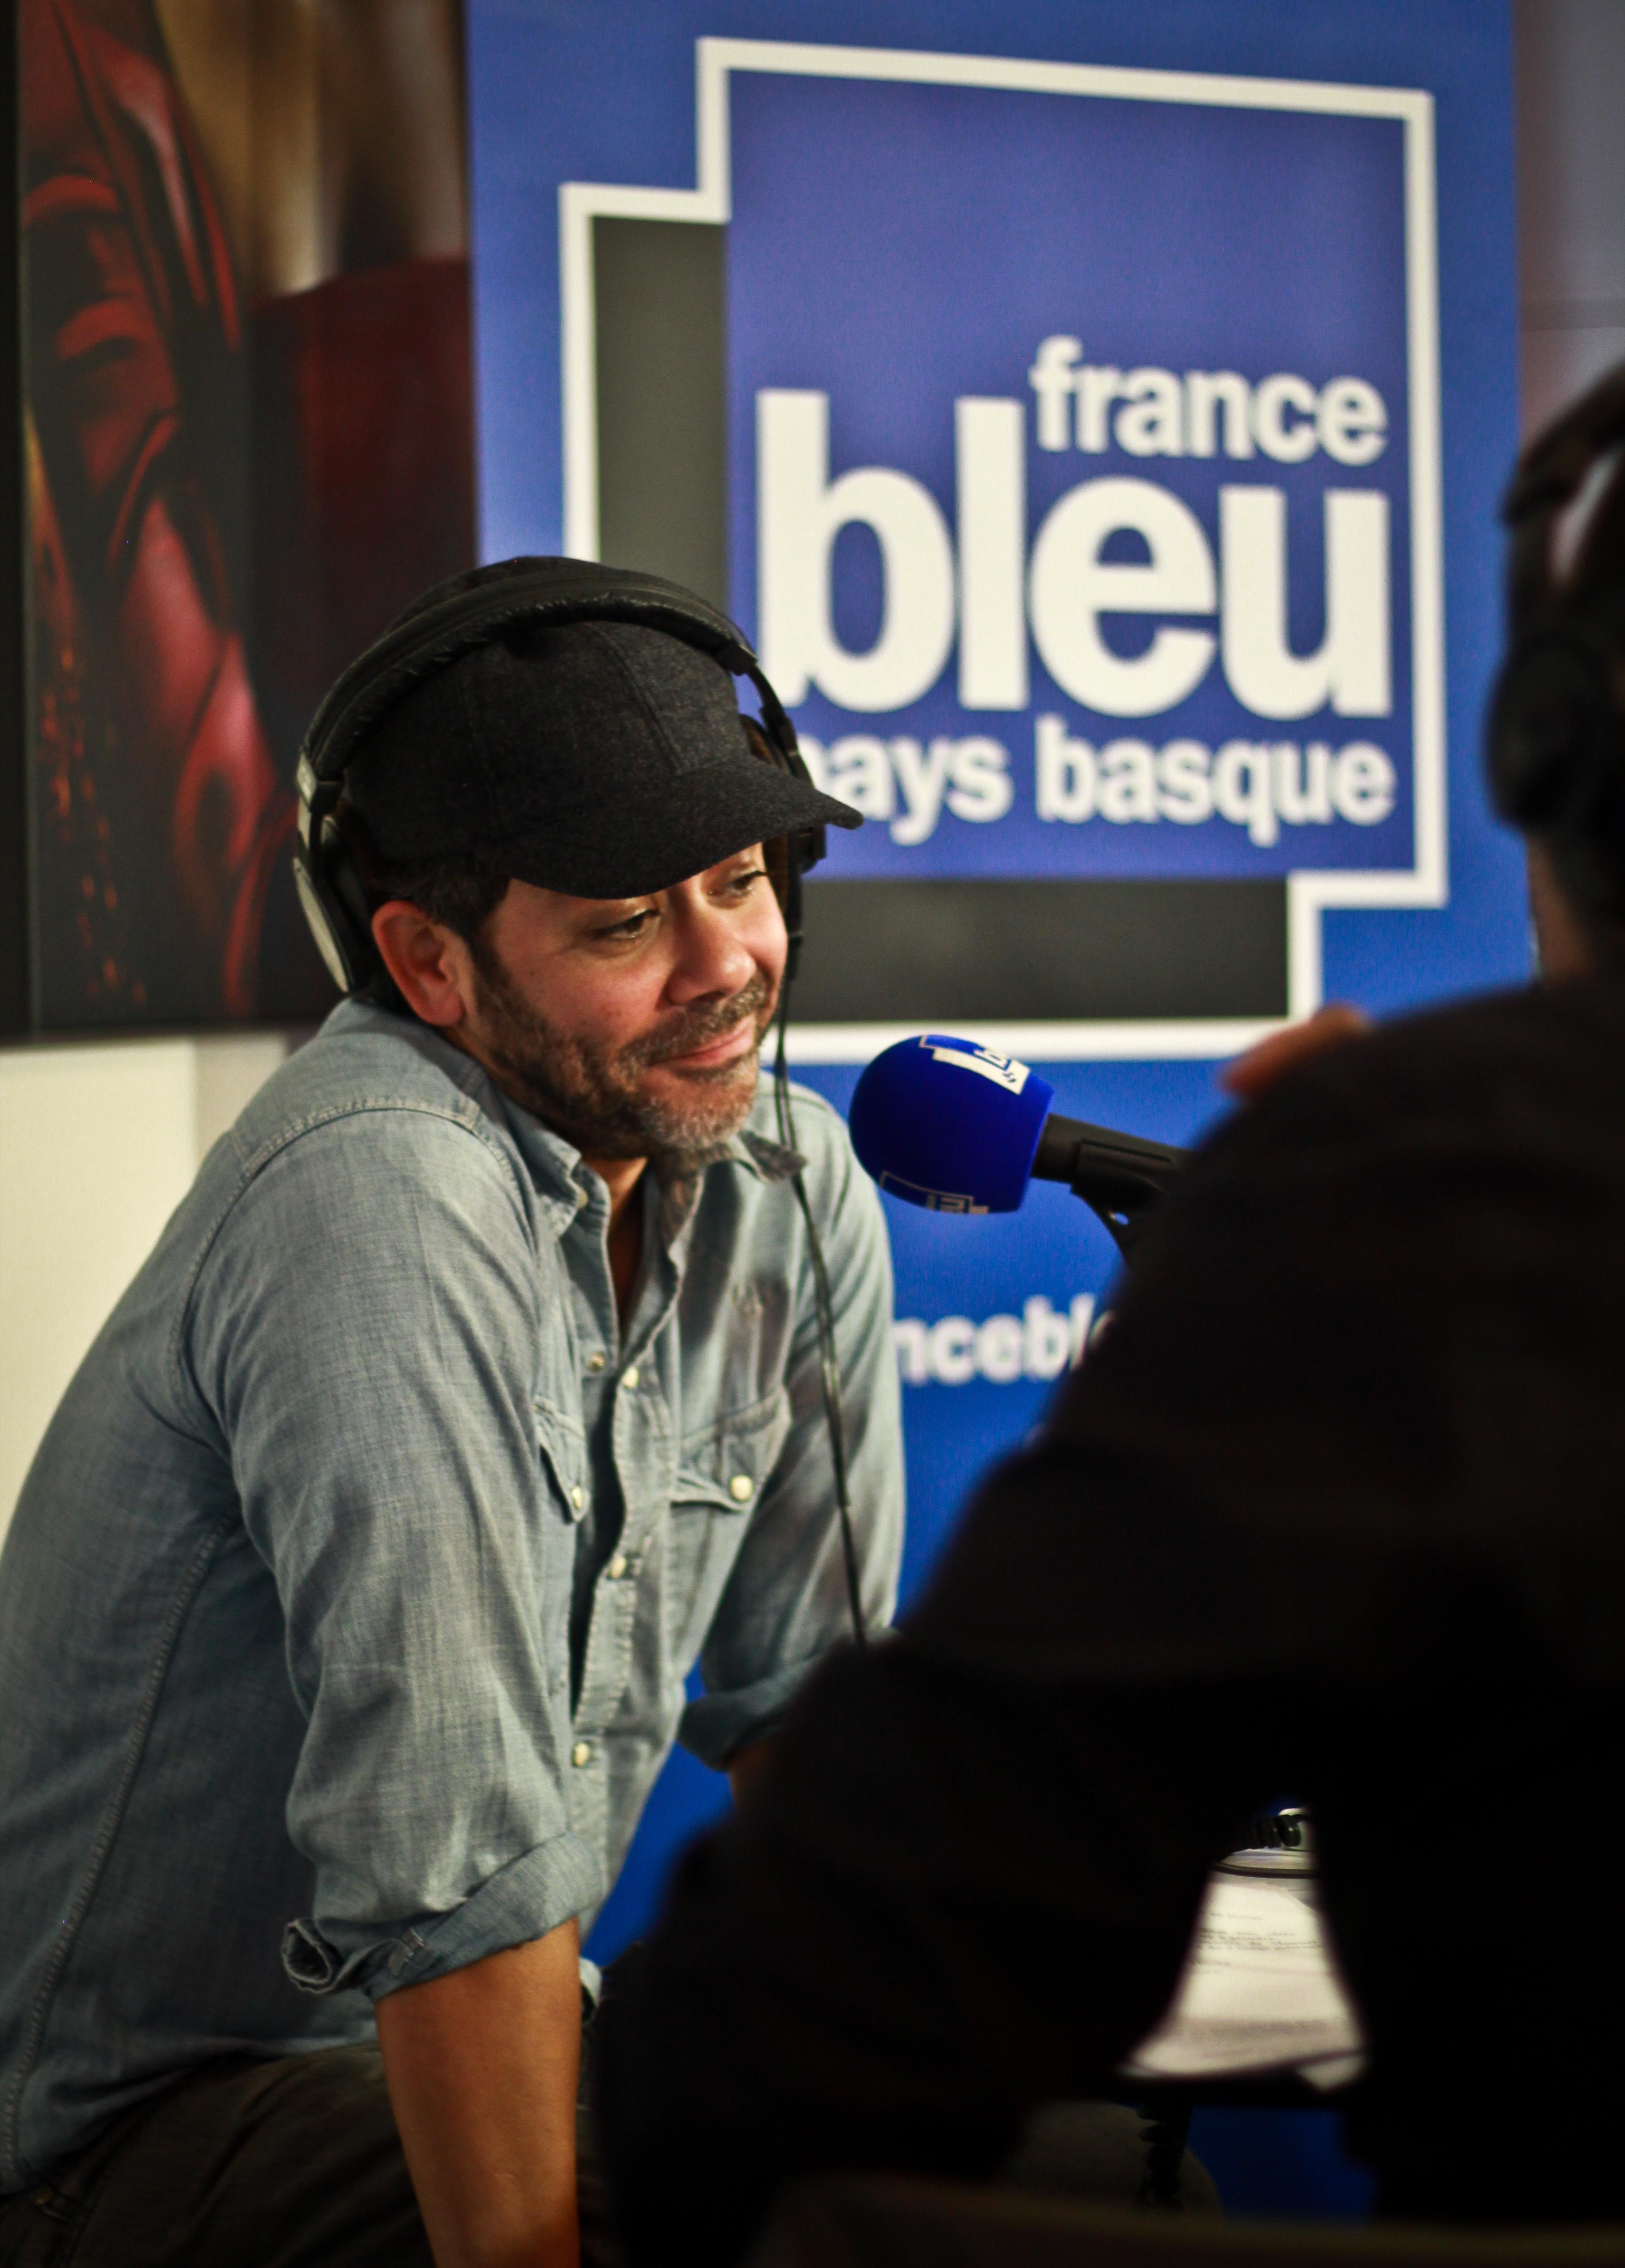 Direct France Bleu Pays Basque